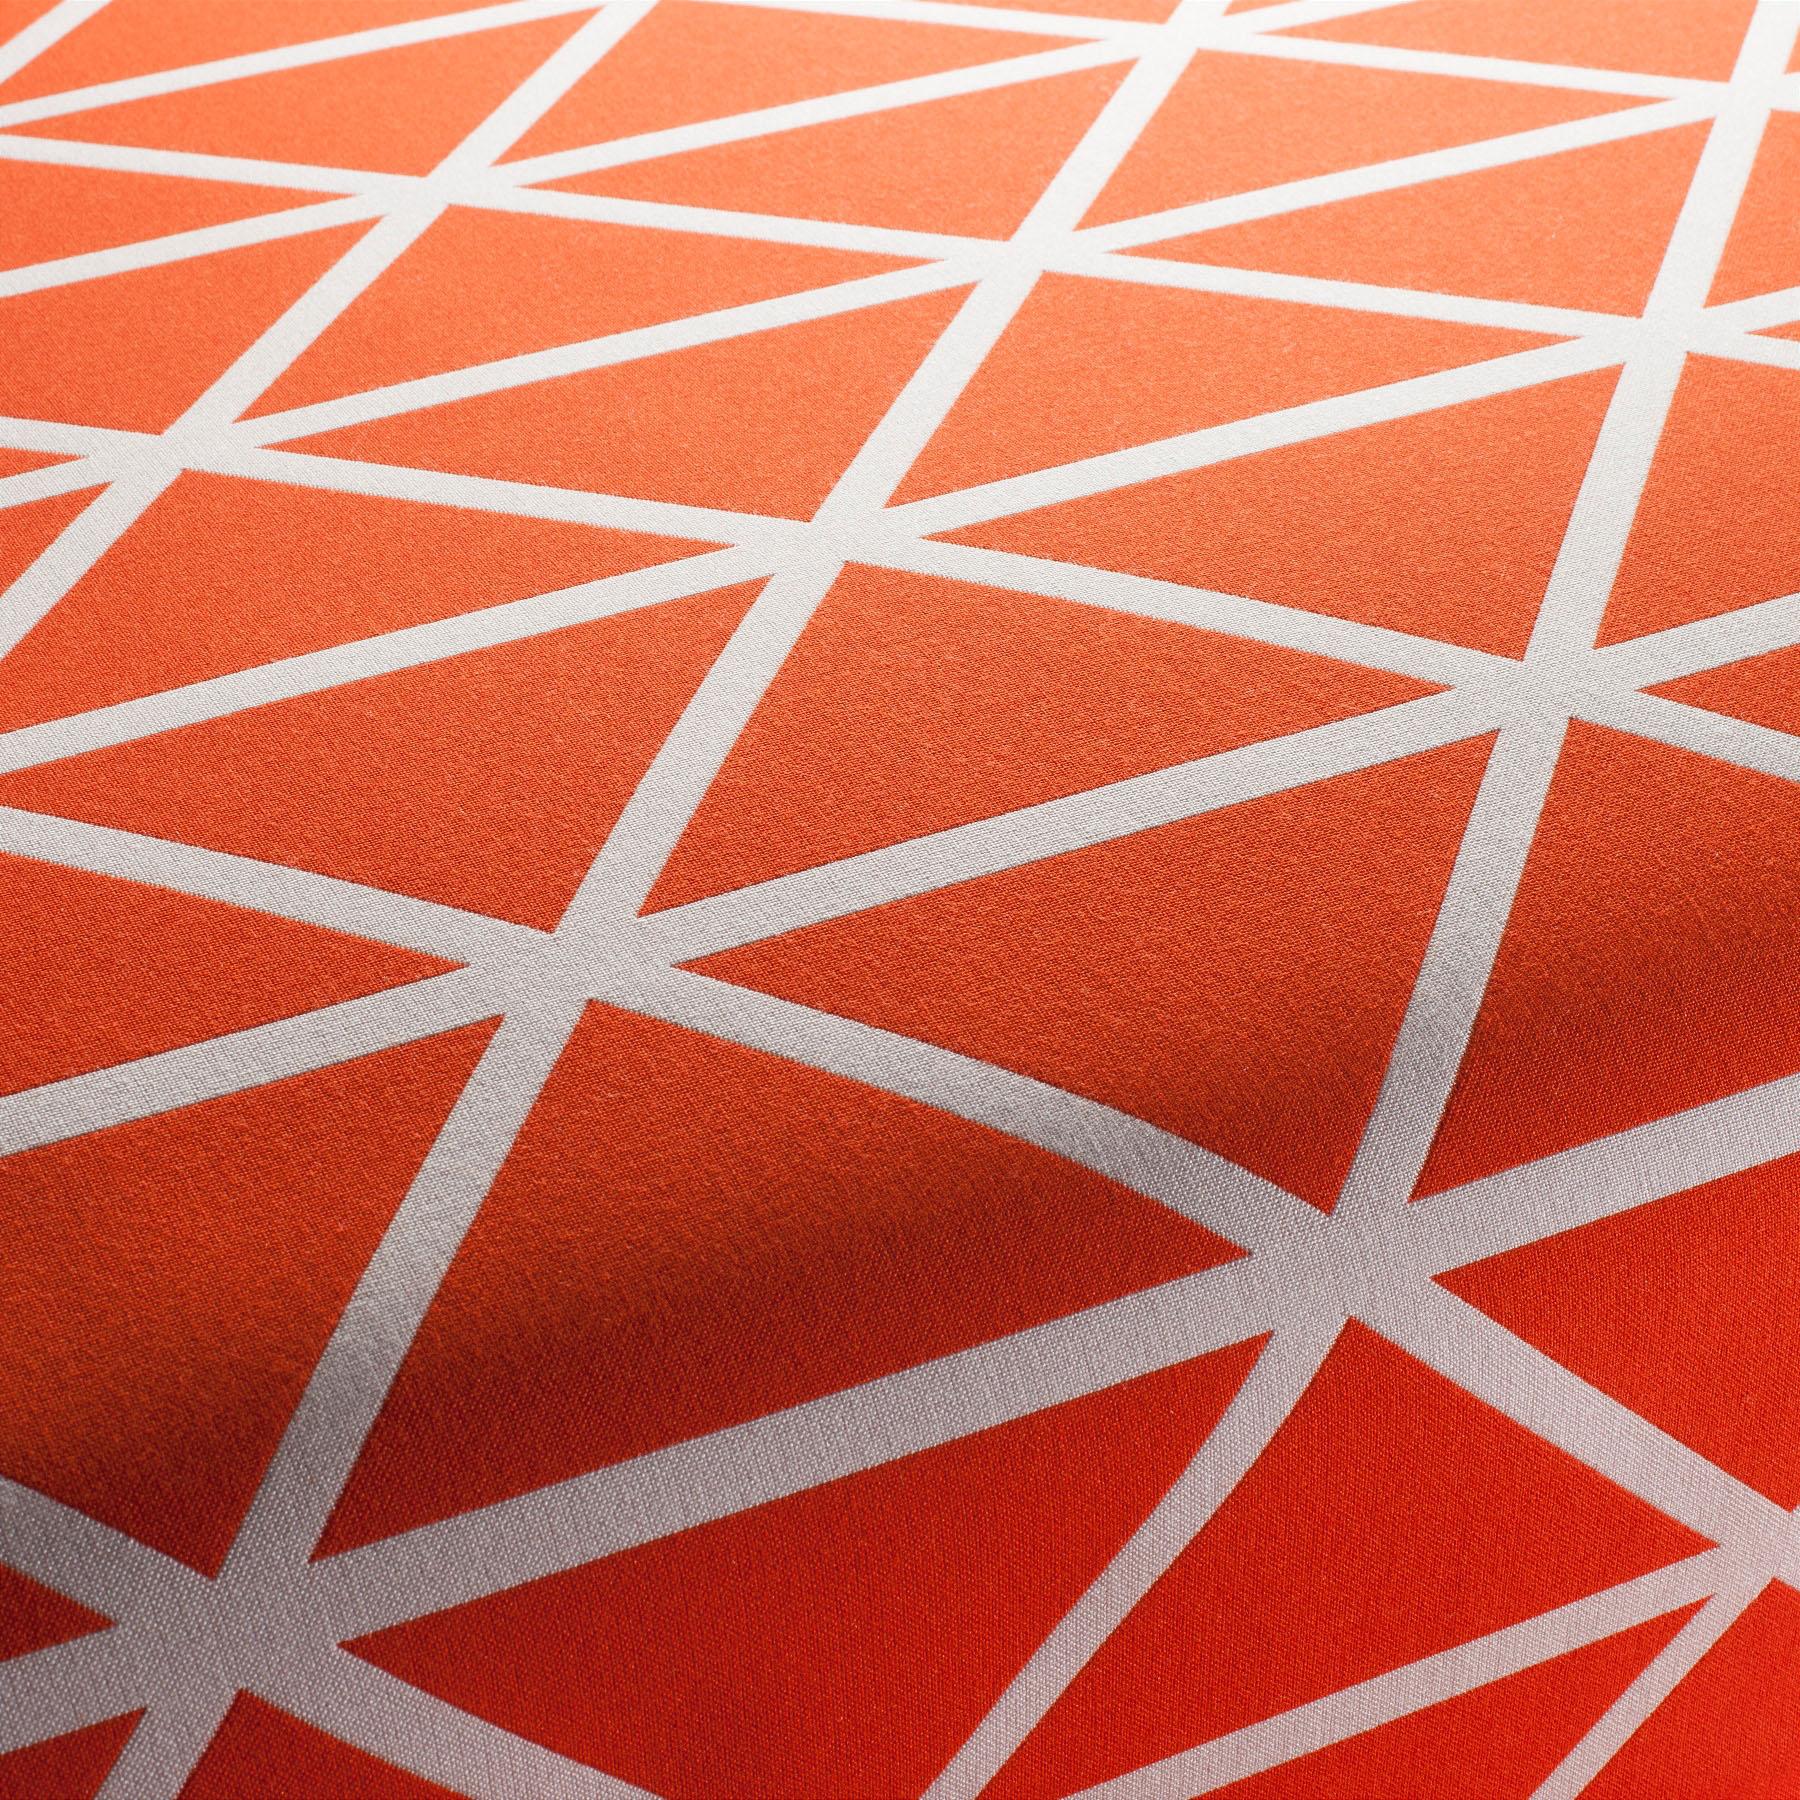 Upholstery Fabric Profile 9 2129 060 Jab Anstoetz Fabrics